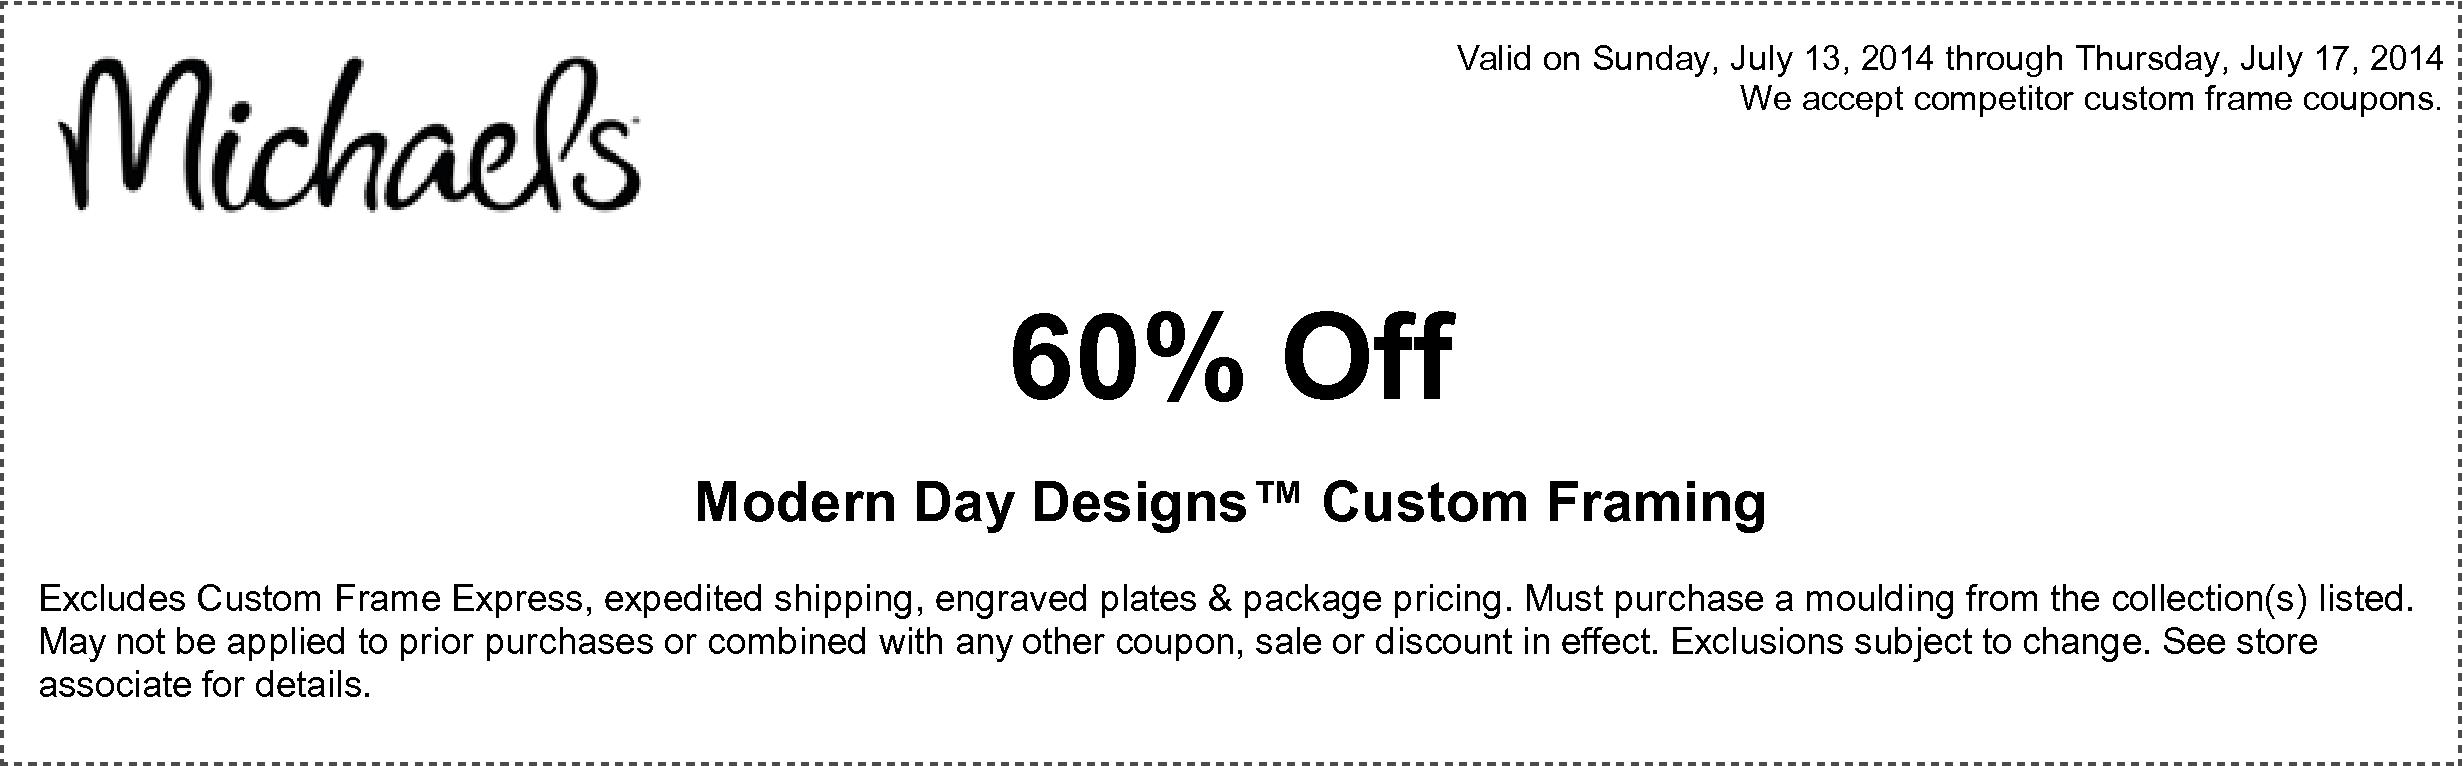 13 deals coupon code